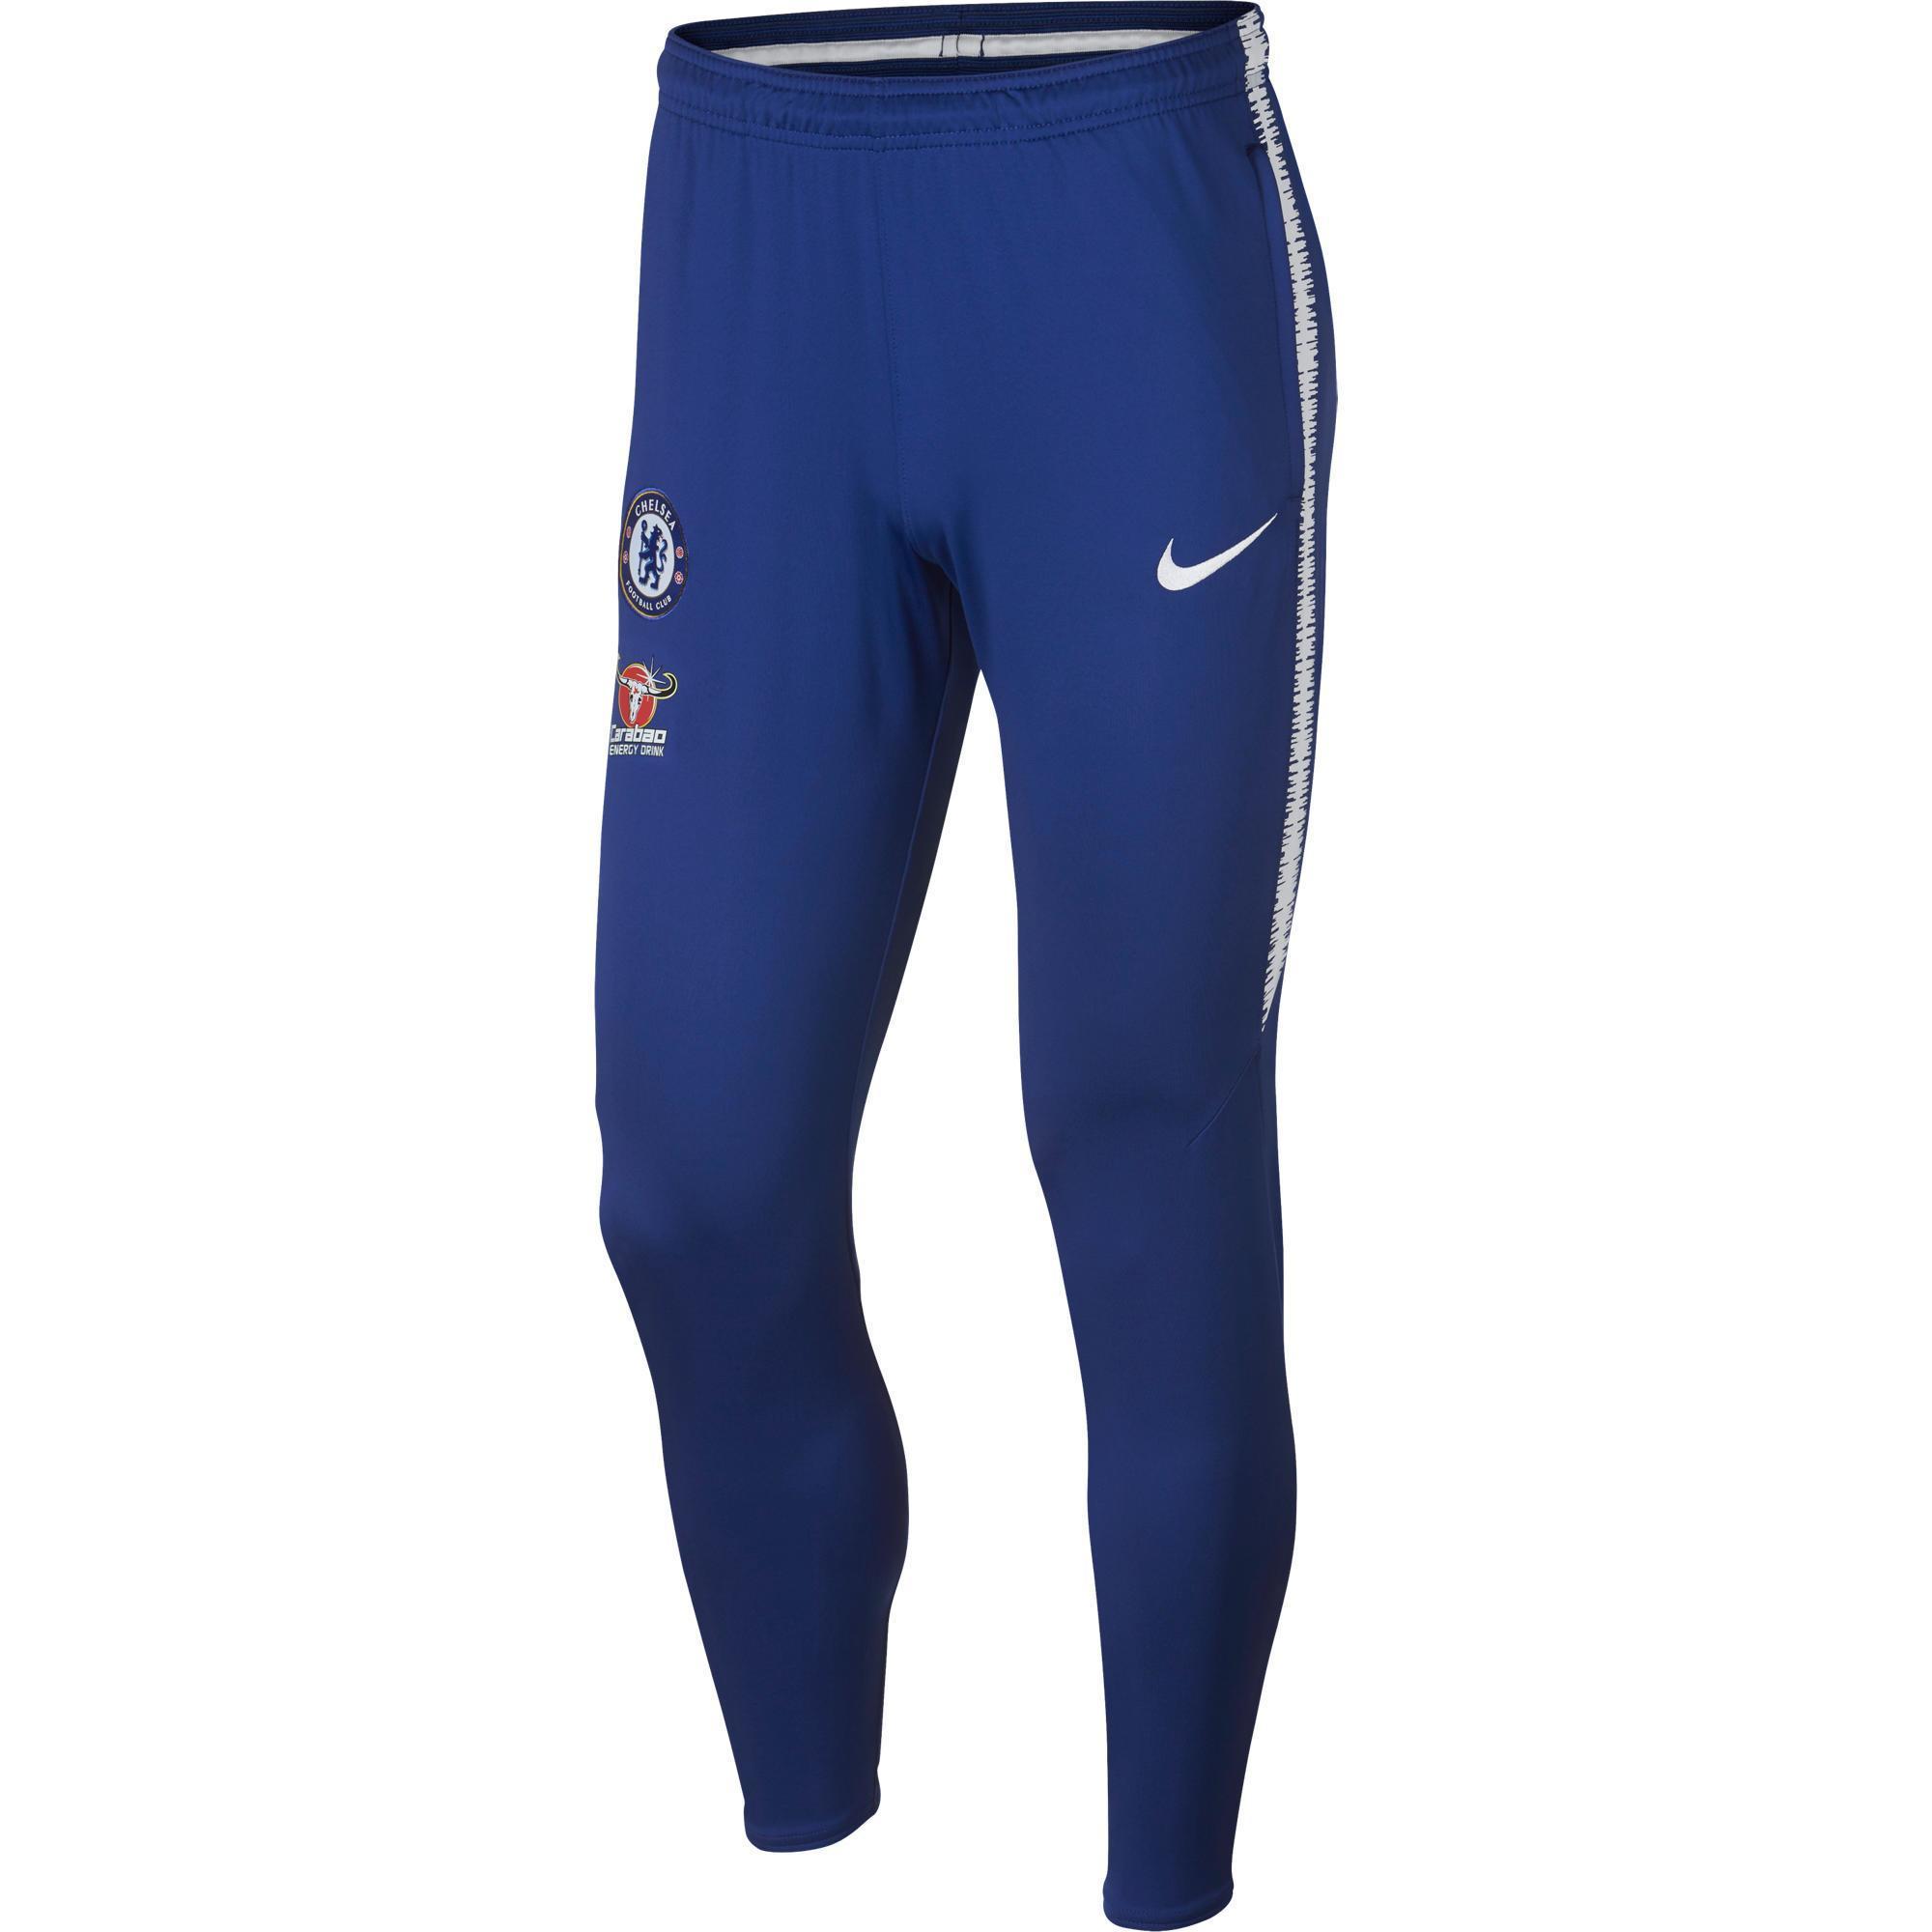 Fußball-Trainingshose Keilform Chelsea Erwachsene | Sportbekleidung > Sporthosen > Trainingshosen | Nike